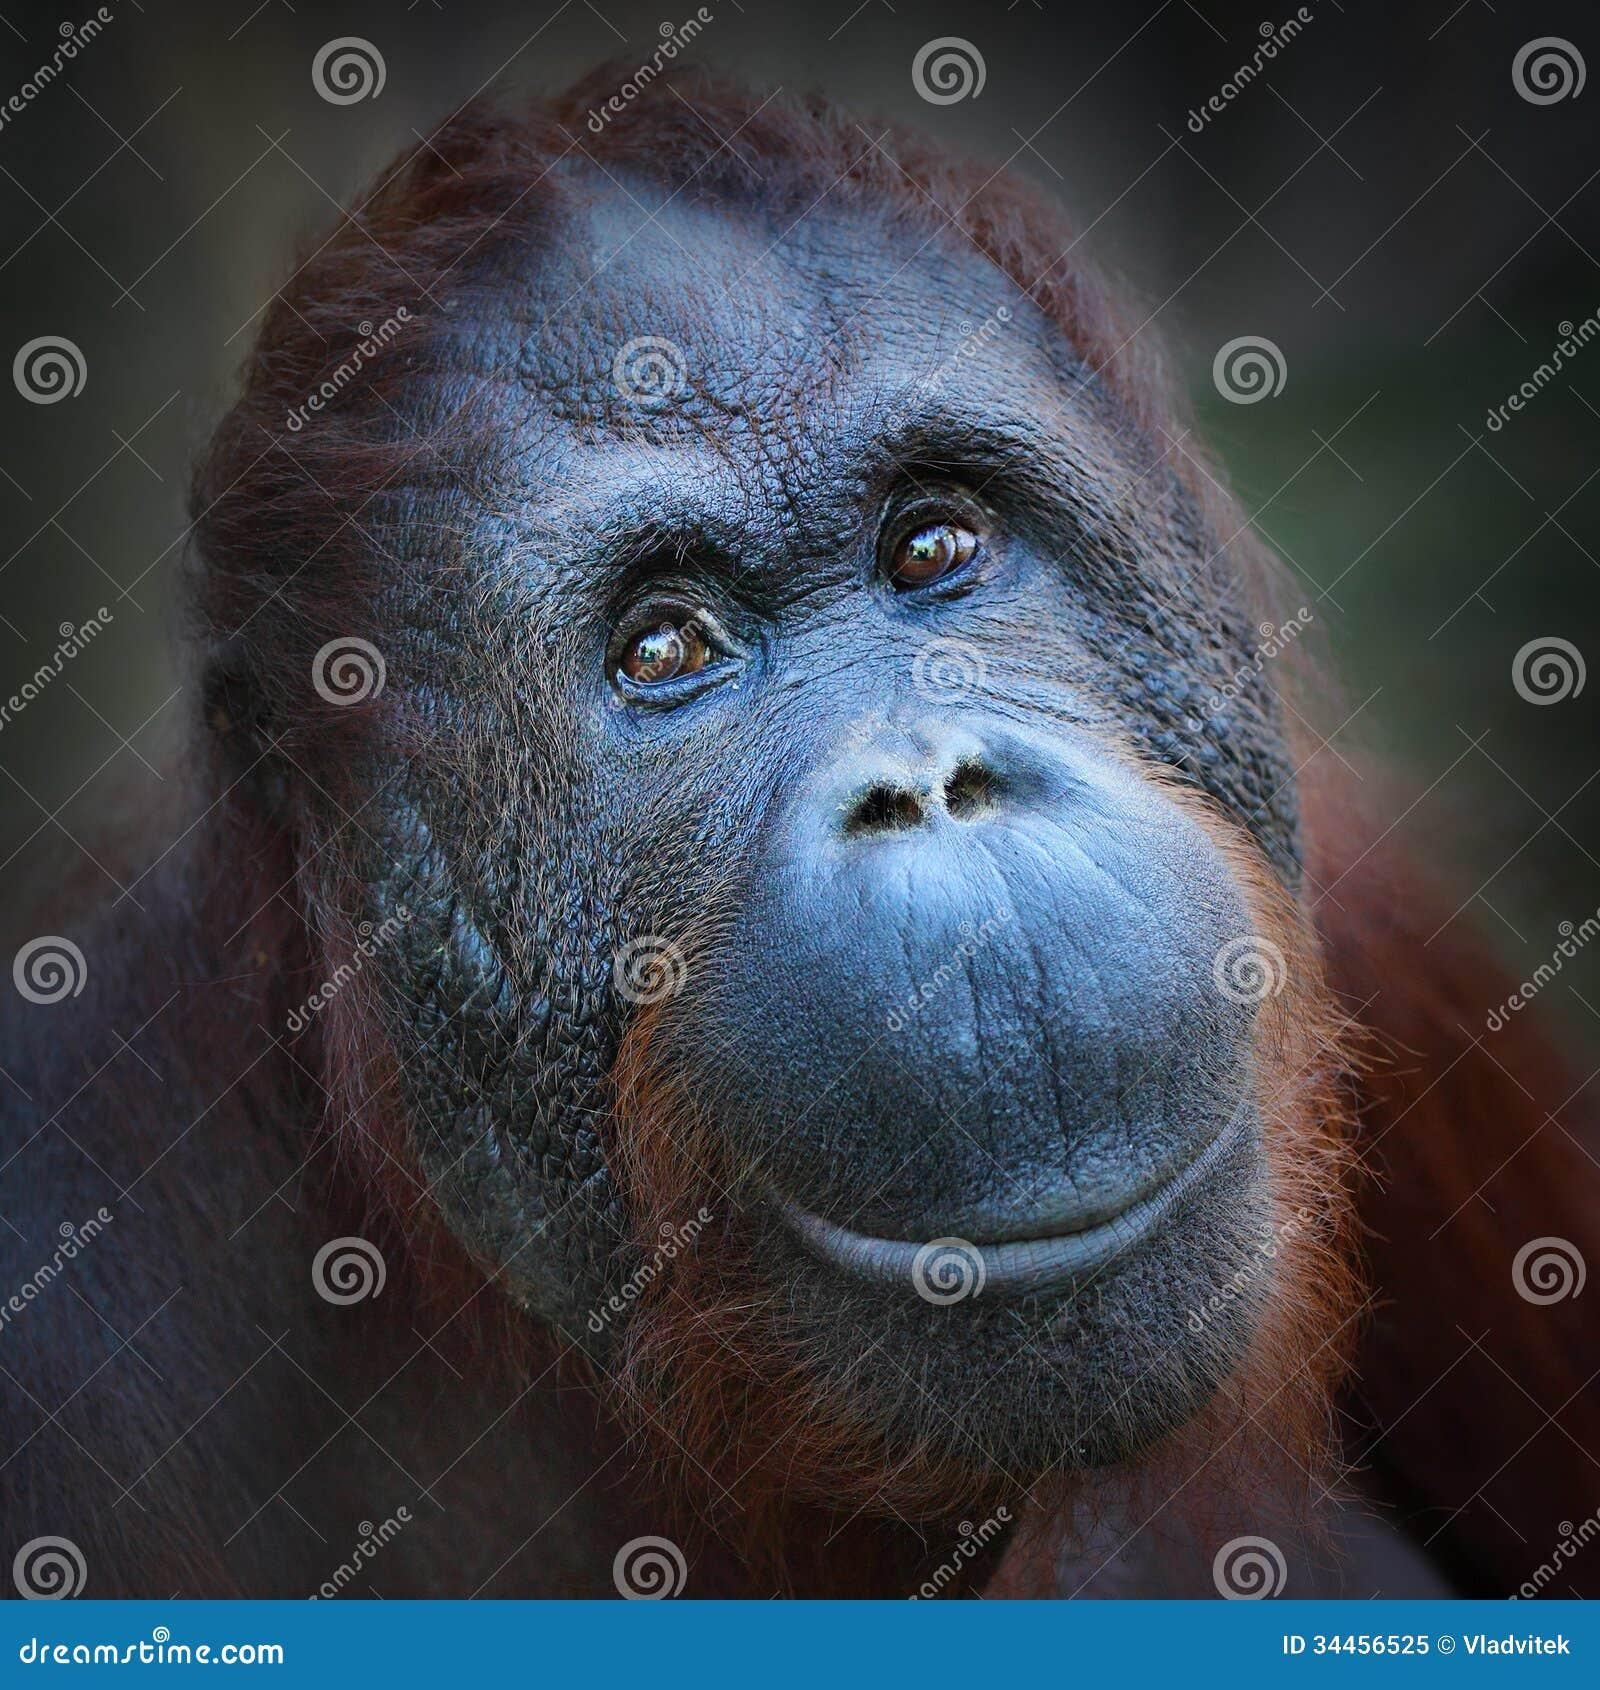 Bornean猩猩(类人猿pygmaeus)。